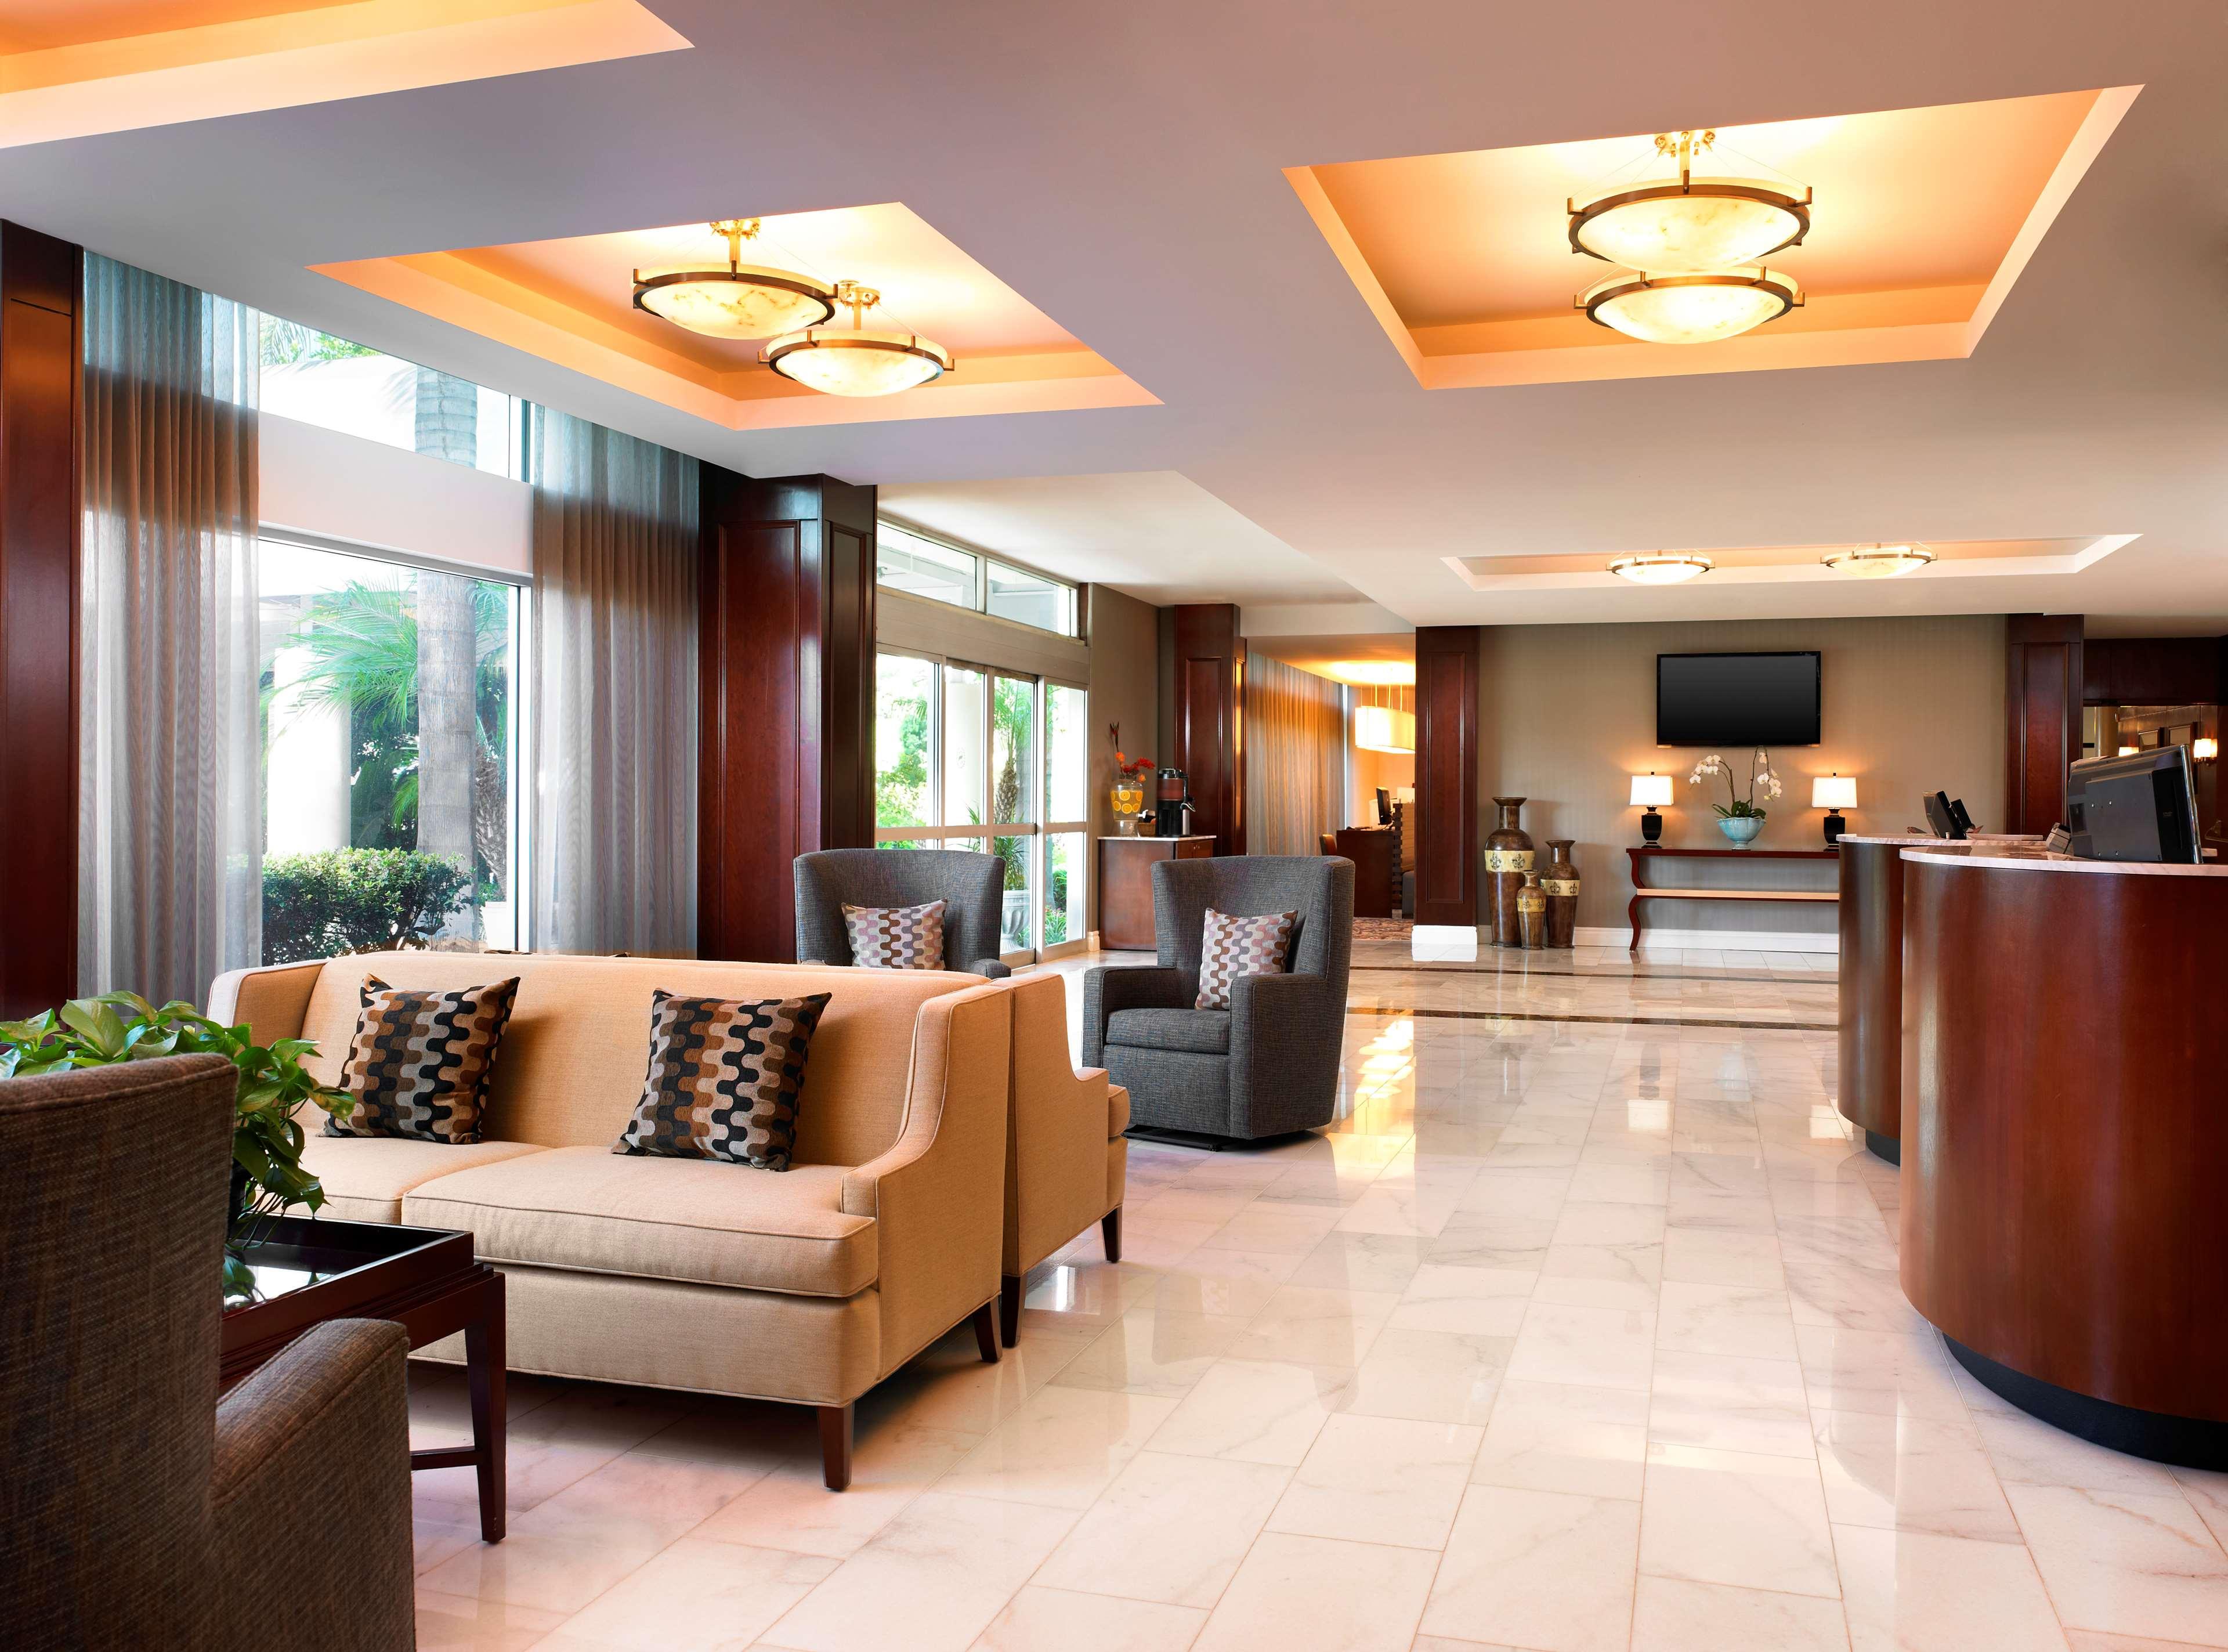 sheraton ontario airport hotel in ontario ca 909 937 8. Black Bedroom Furniture Sets. Home Design Ideas